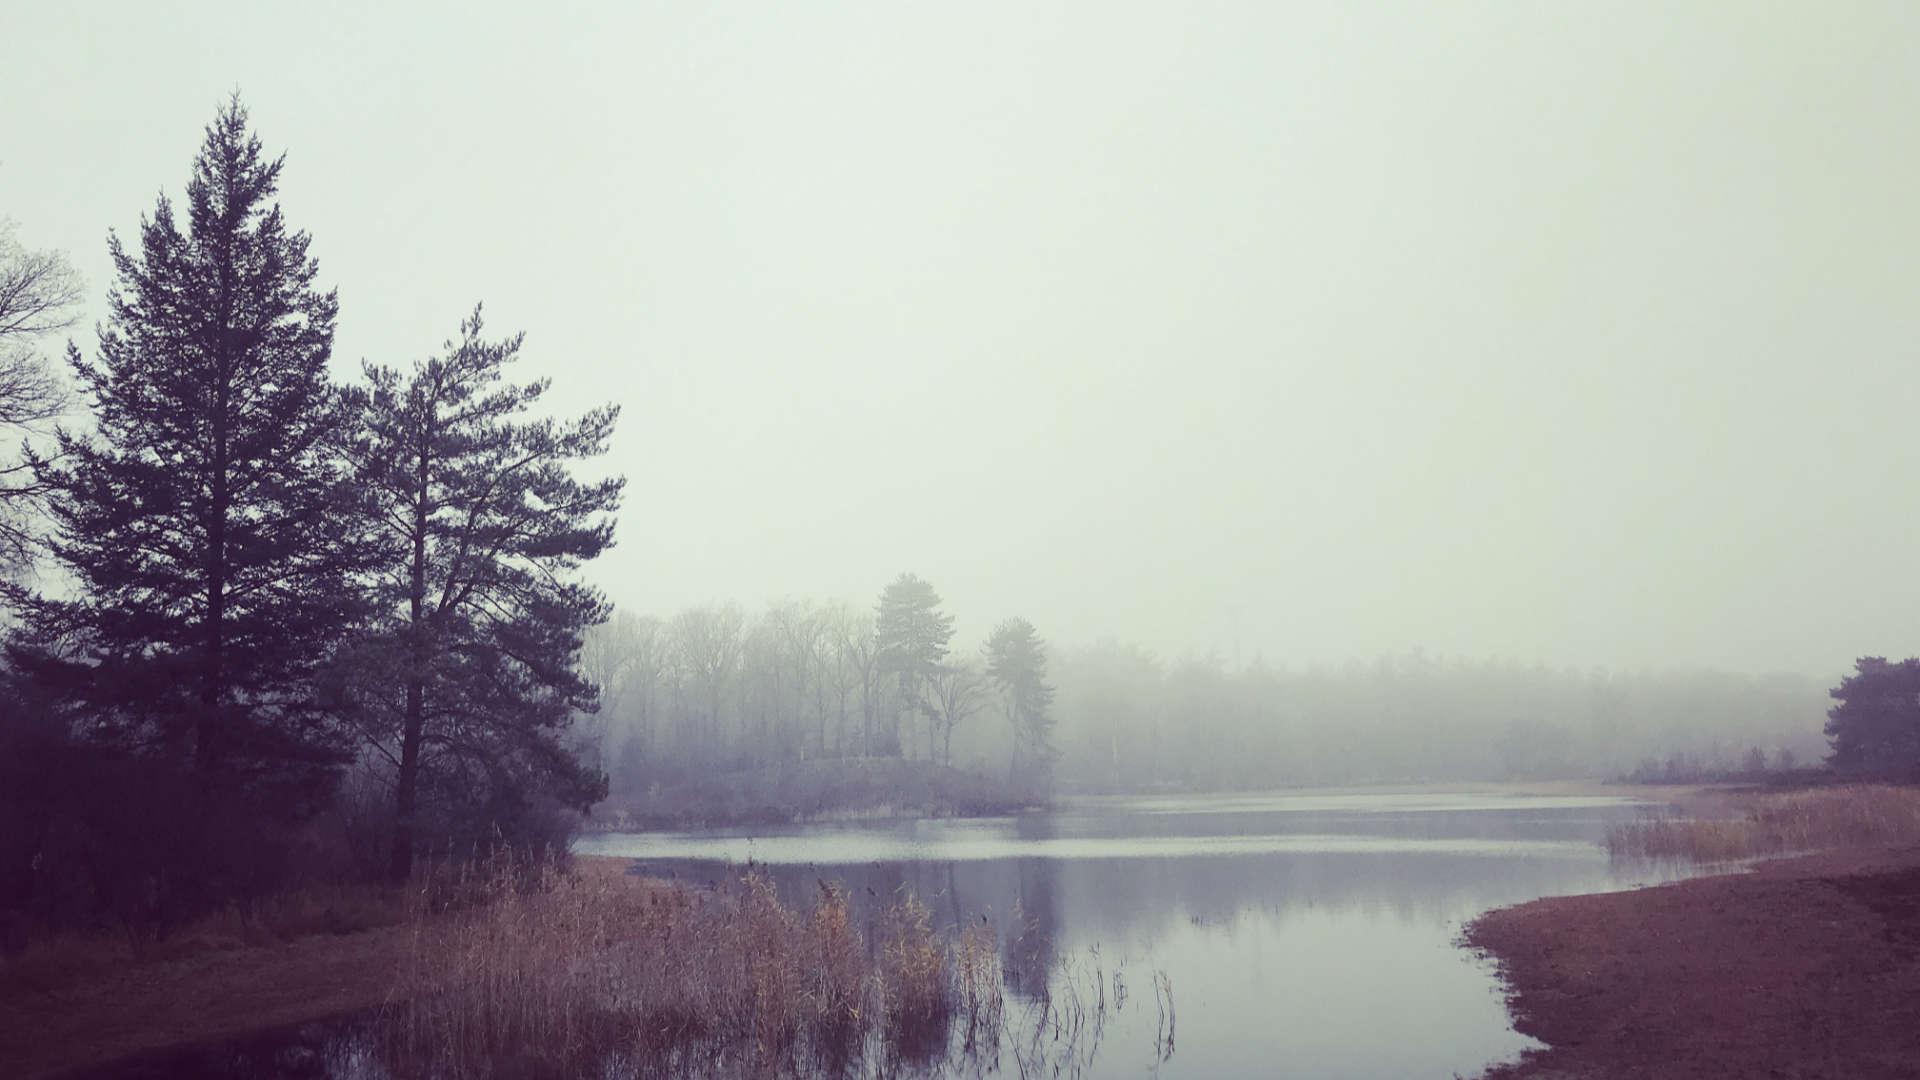 oude vijver zwarte dennen mist